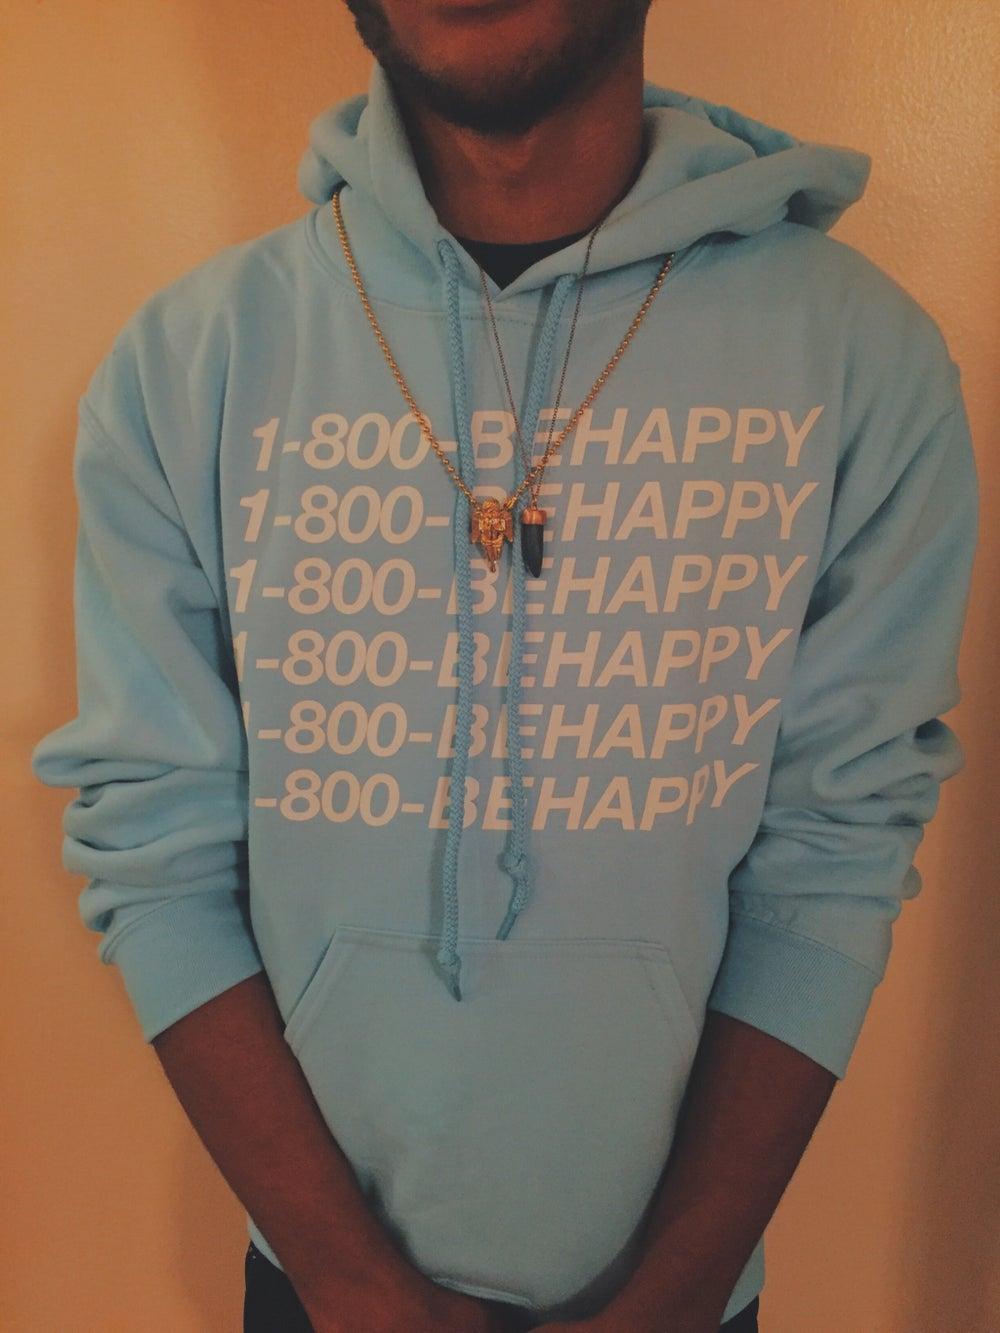 Image of Light Blue 1-800-BEHAPPY Hoodie